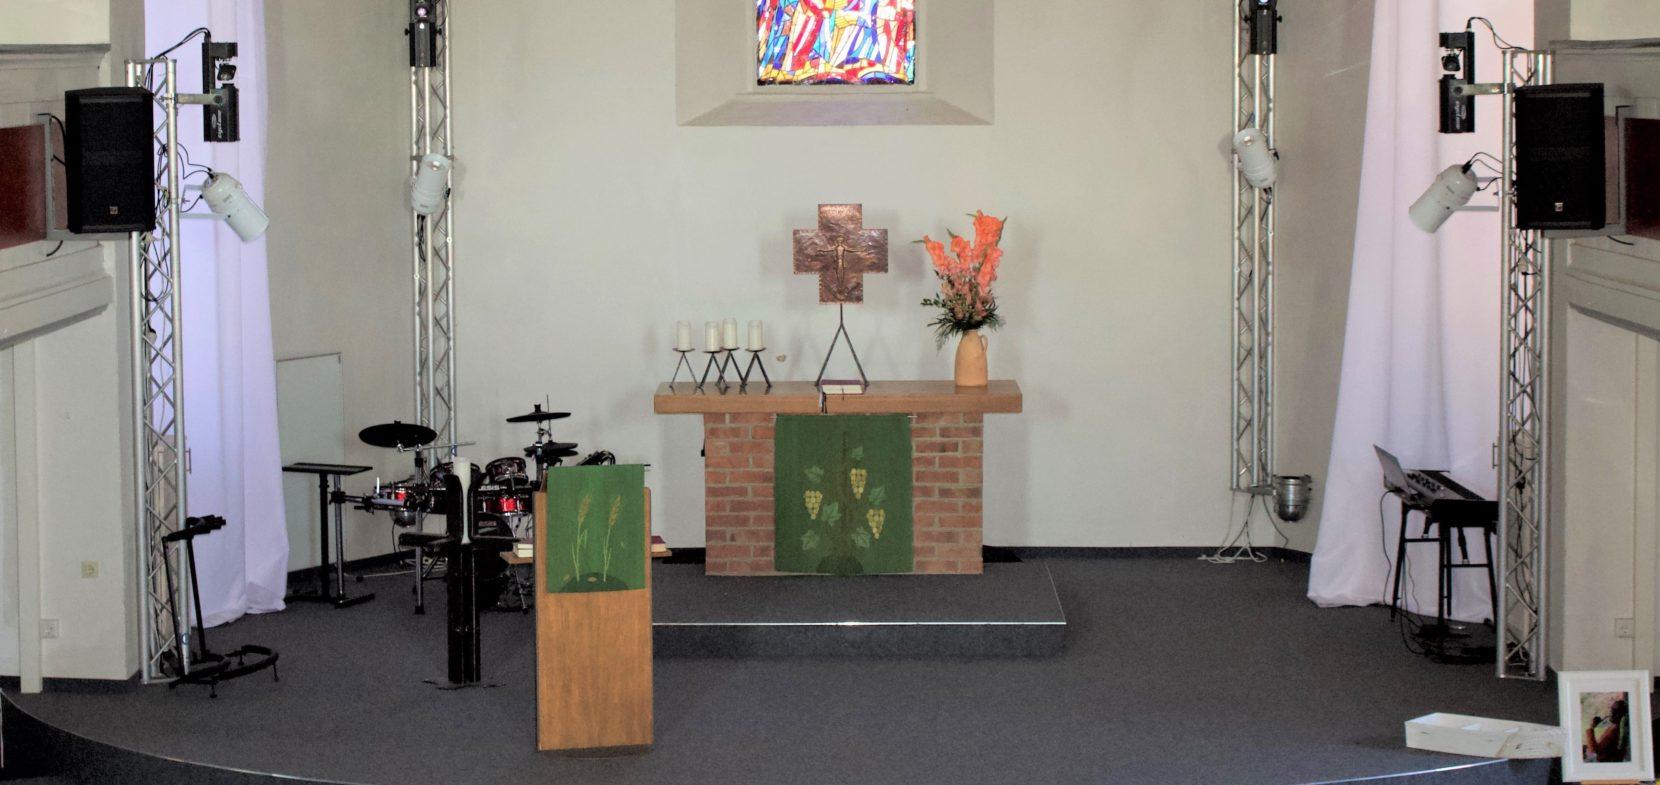 Ev.-Luth. Kirchgemeinde Großgrabe